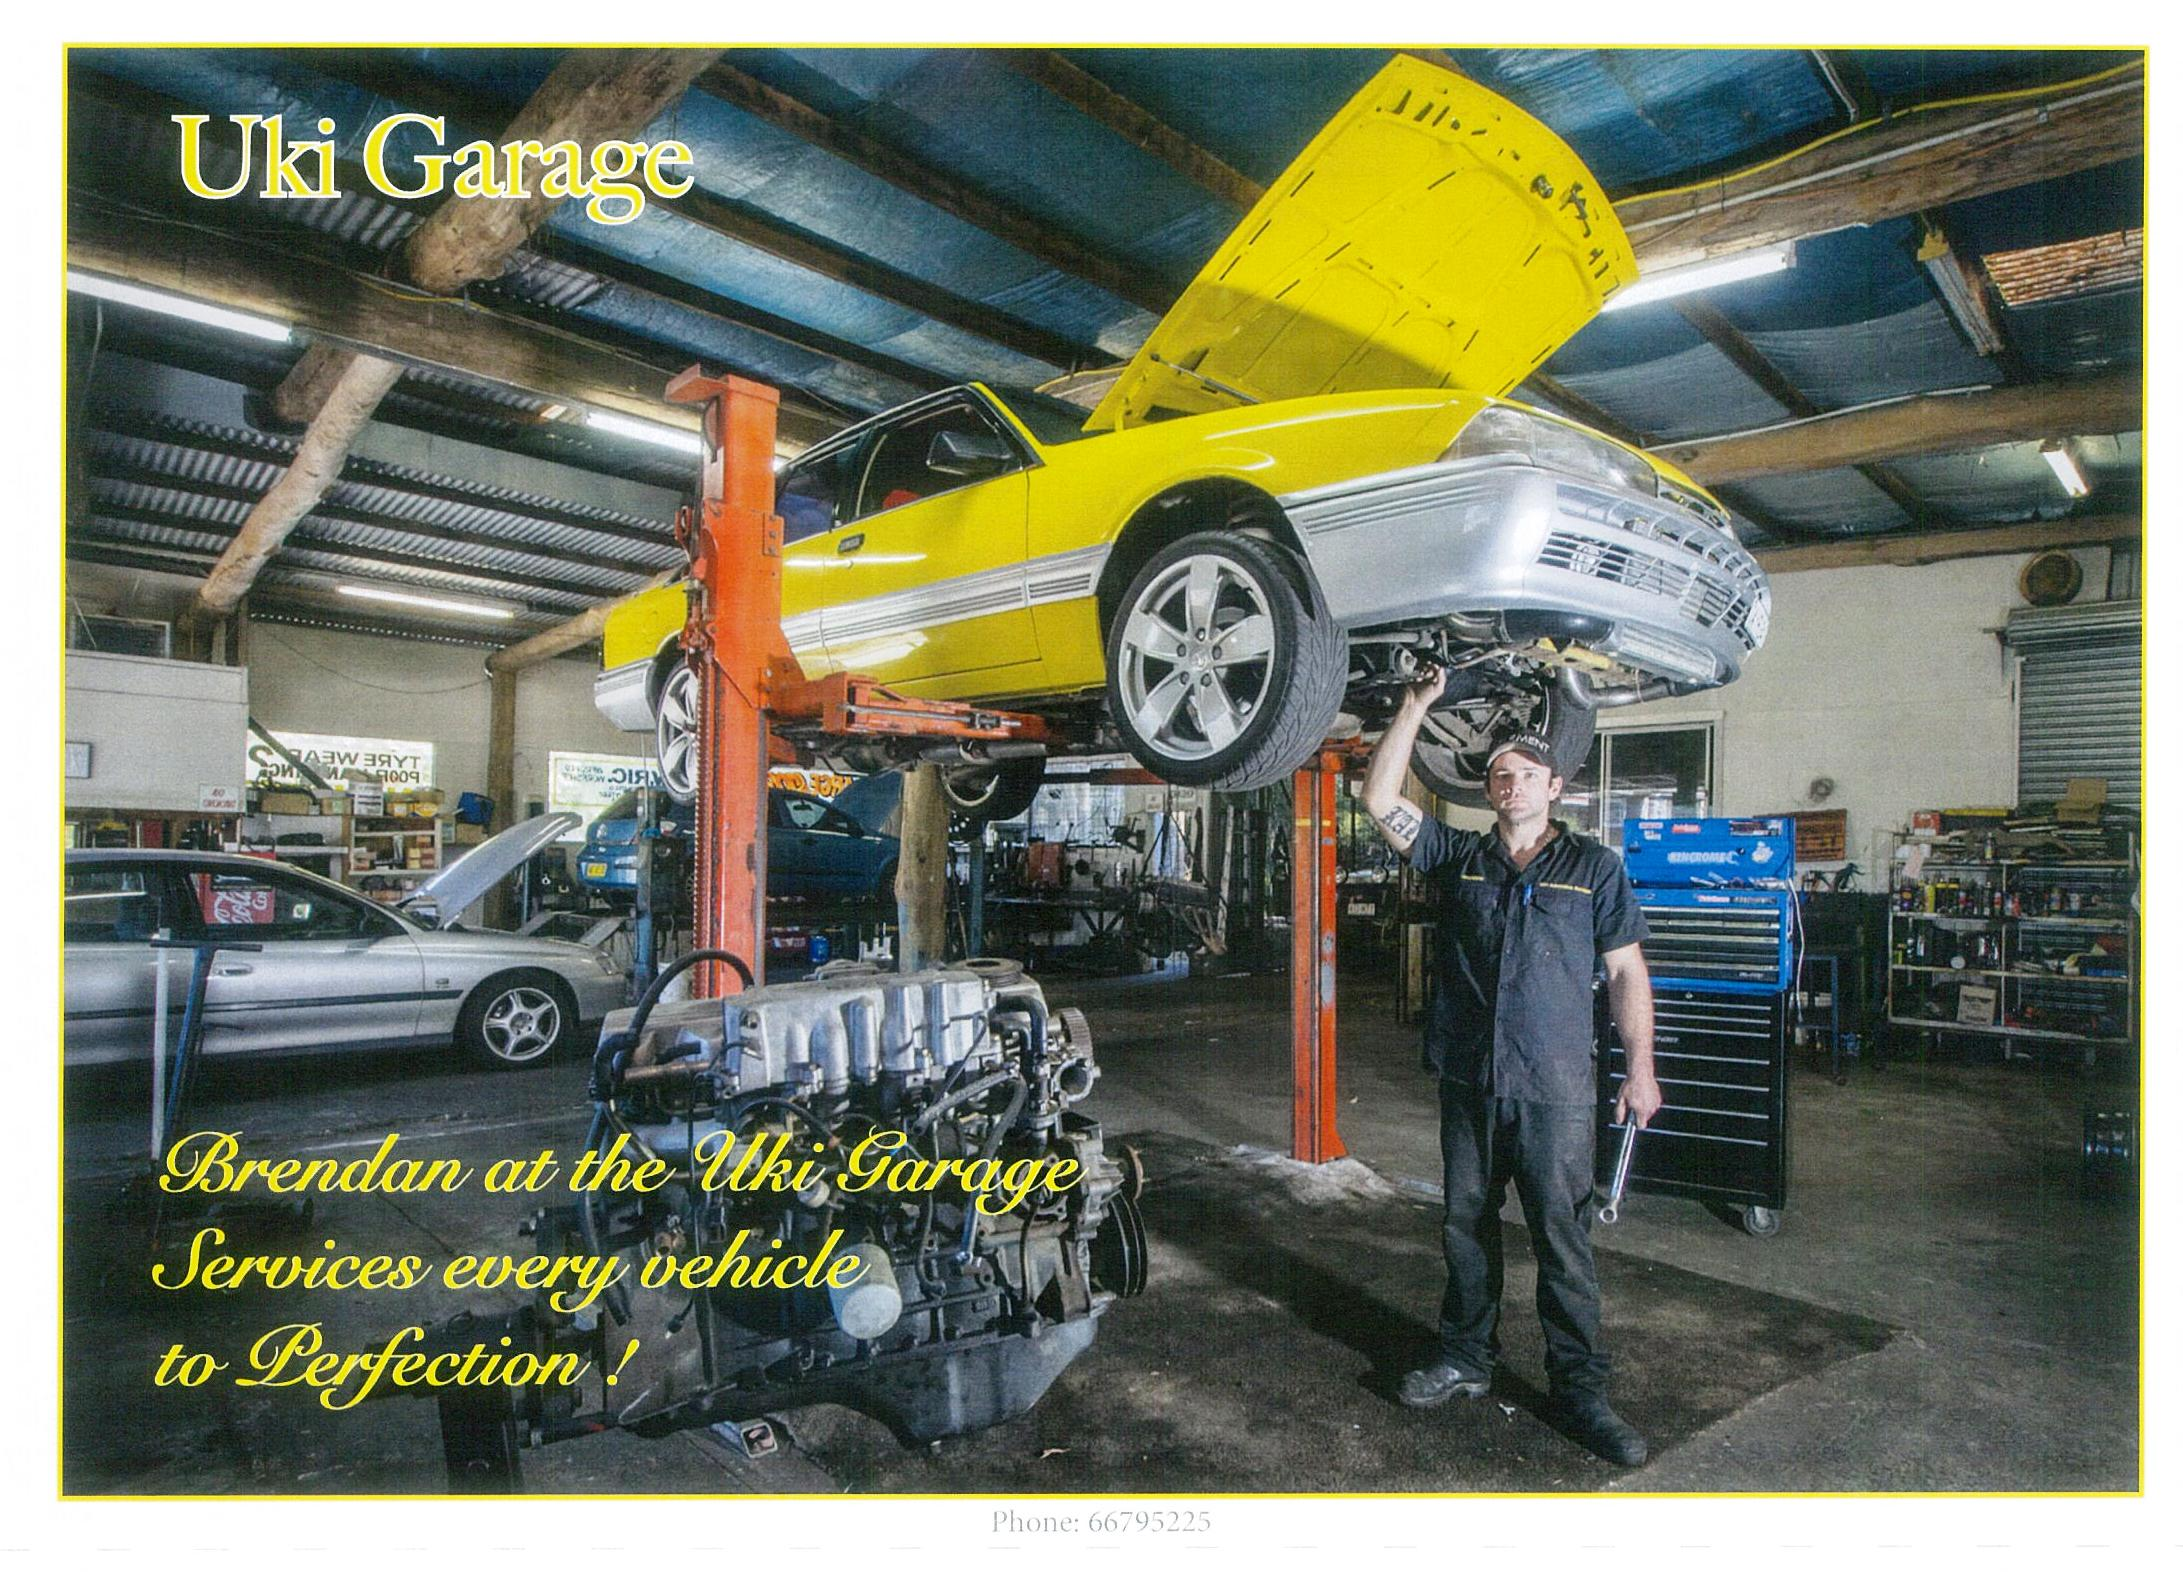 Uki Garage